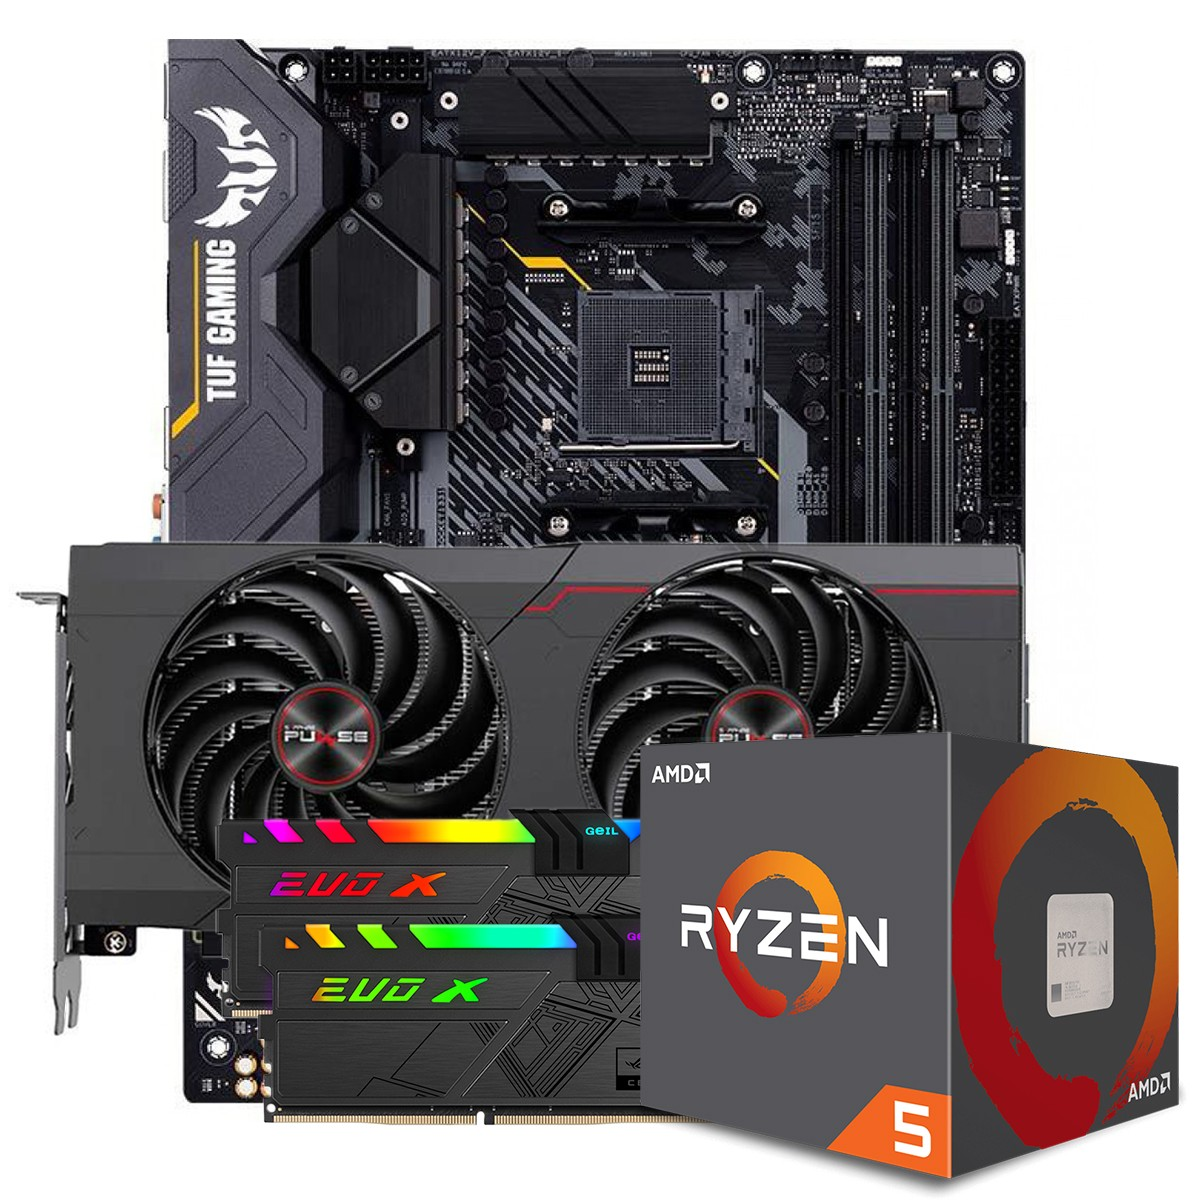 Kit Upgrade Sapphire Pulse Radeon RX 6700 XT + AMD Ryzen 5 5600X + ASUS TUF Gaming X570-Plus + Memória DDR4 16GB (2x8GB) 3600MHz